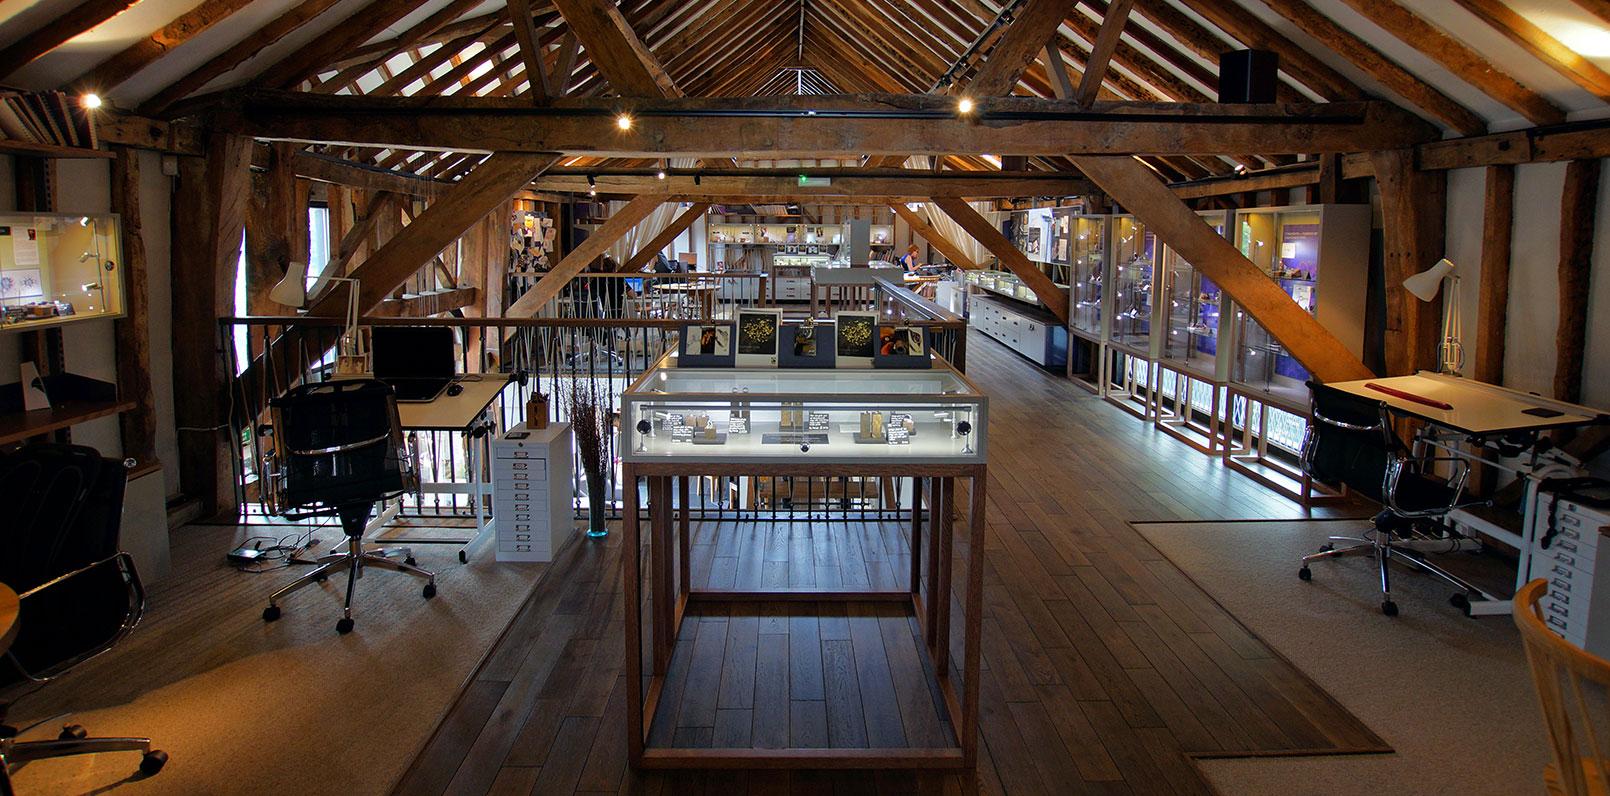 harriet-kelsall-bespoke-jewellery-hertfordshire-barn-interior[1].jpg